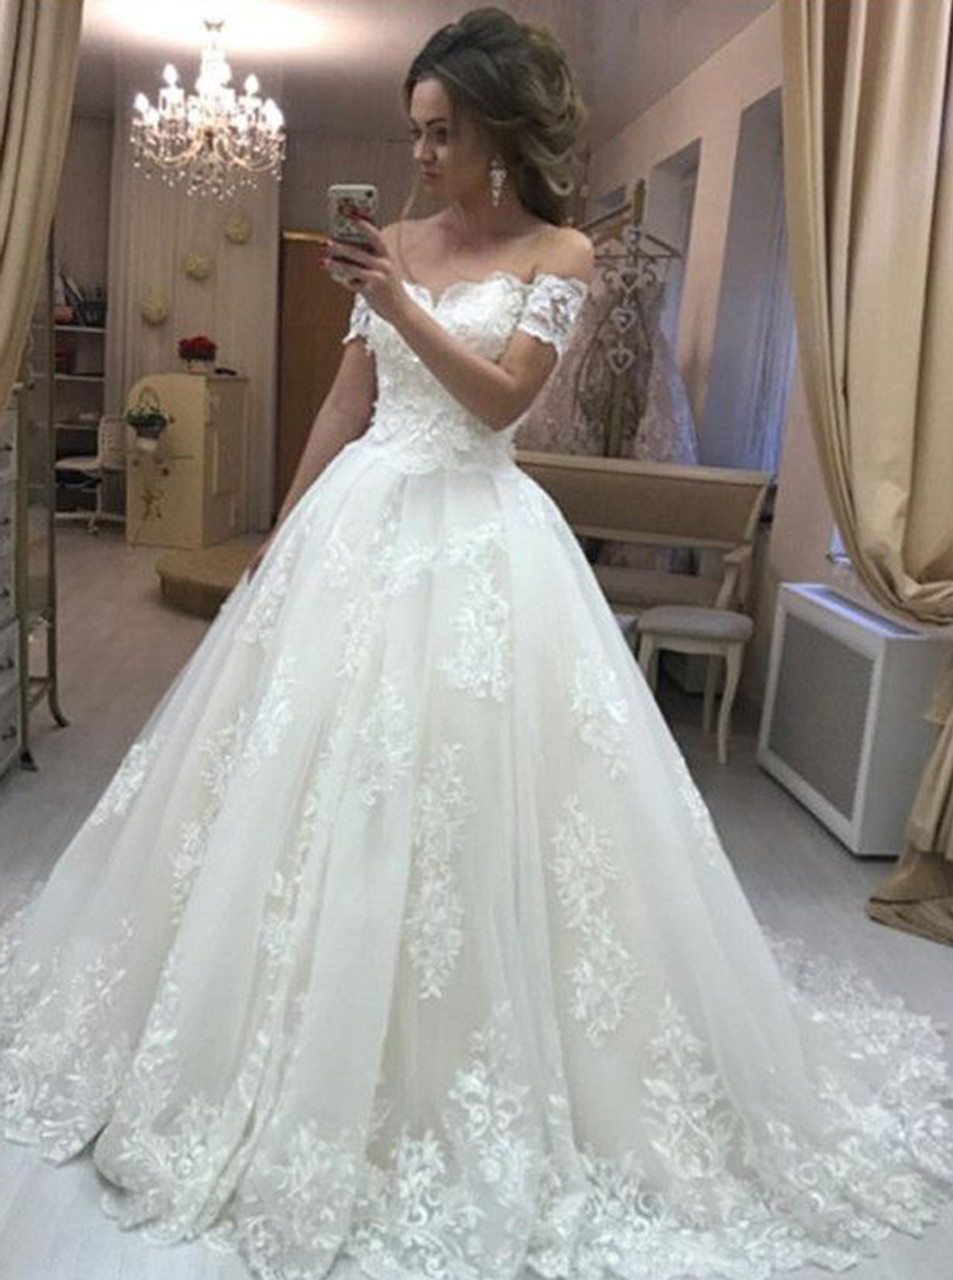 deb006c346521 Princess Off the Shoulder Ball Gown Wedding Dress,Classic Wedding Gown,11640  - Landress.co.uk